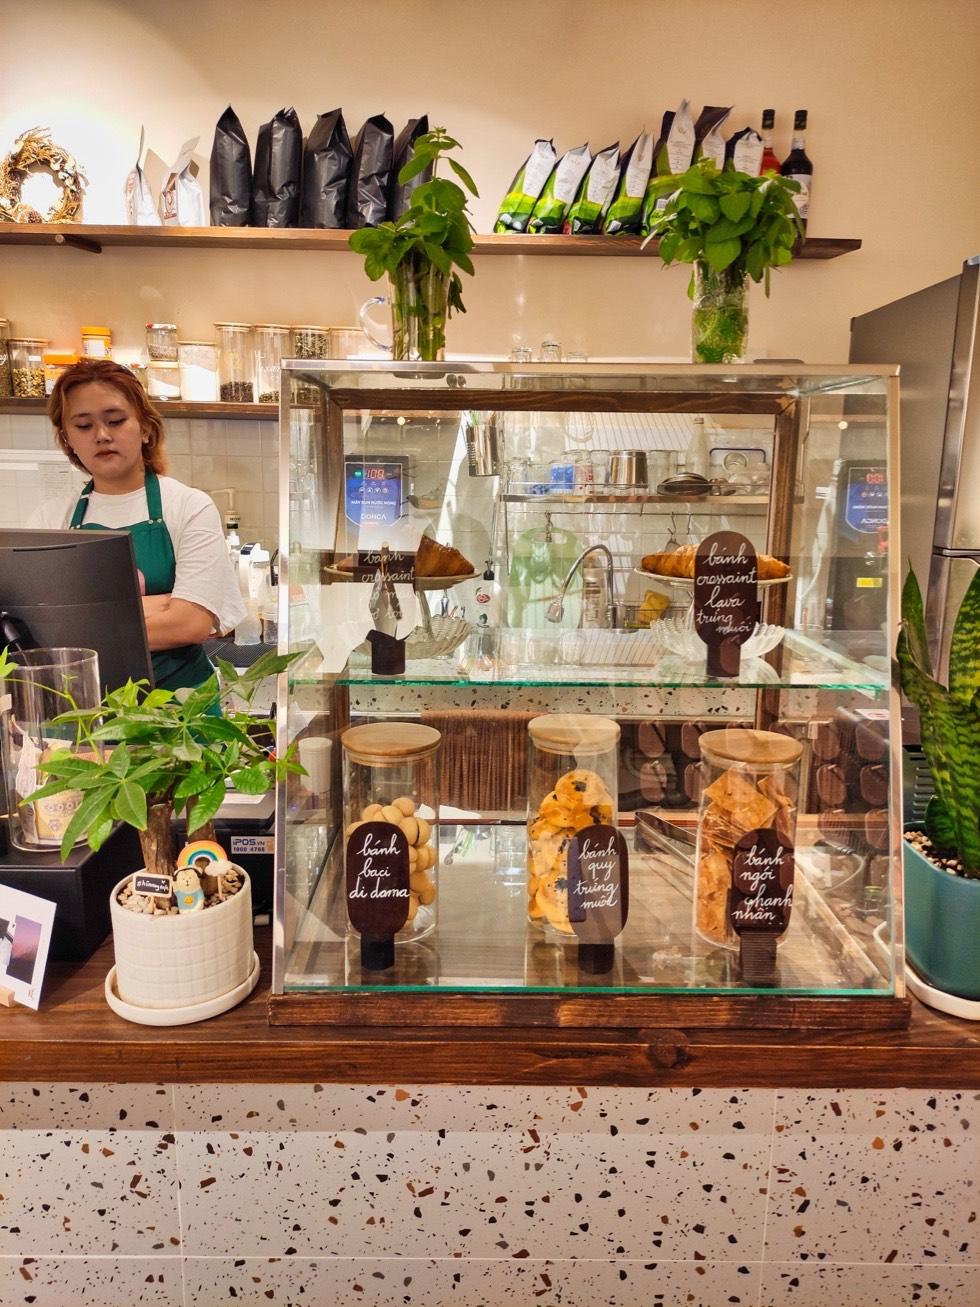 Hôm Nay Cafe Pastries